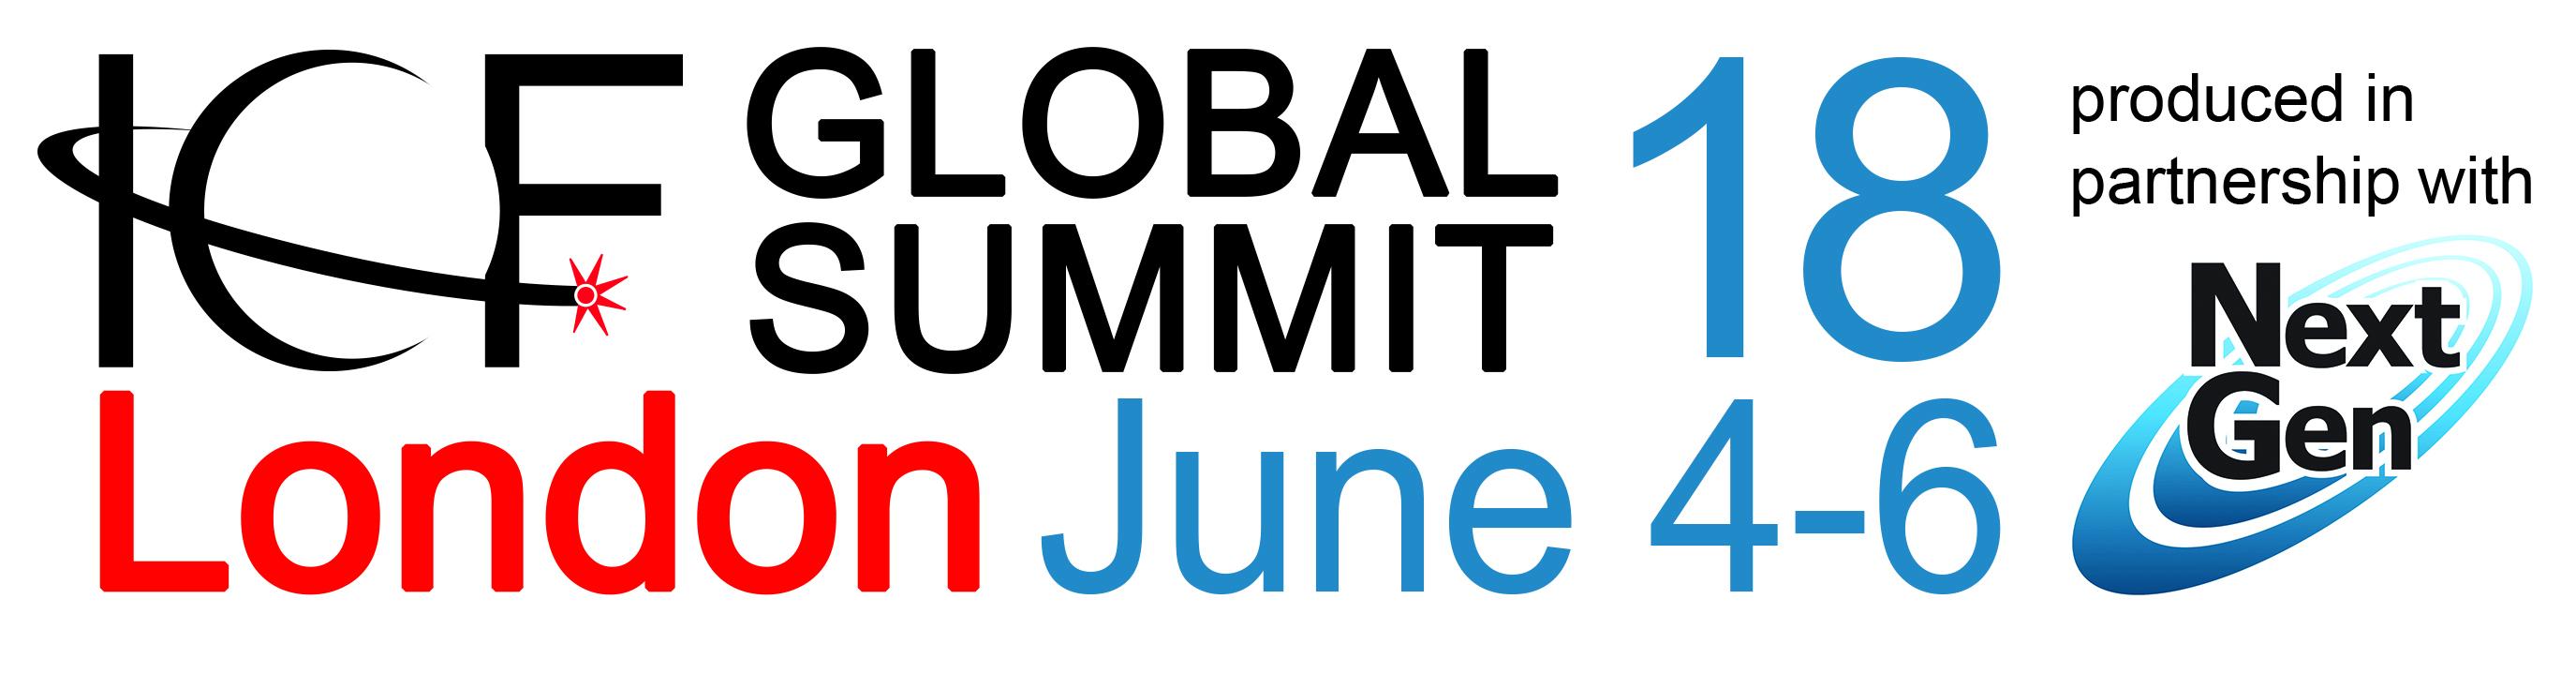 Summit18LogoJune4-6.jpg